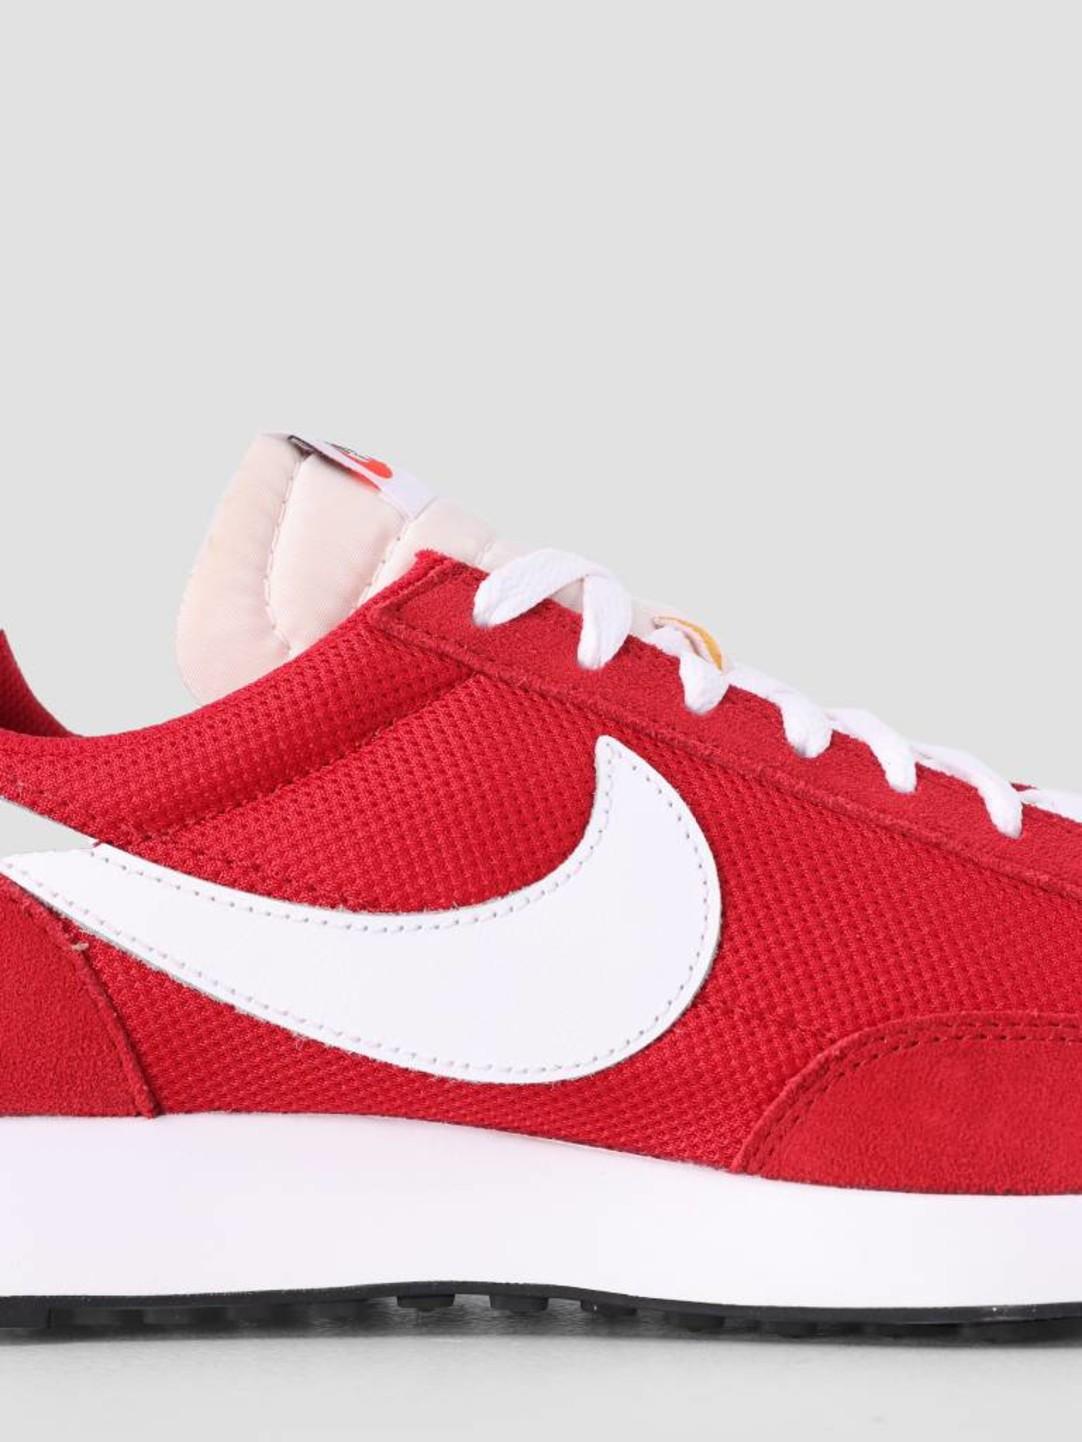 Nike Nike Air Tailwind 79 Gym Red White Black Team Orange 487754-602